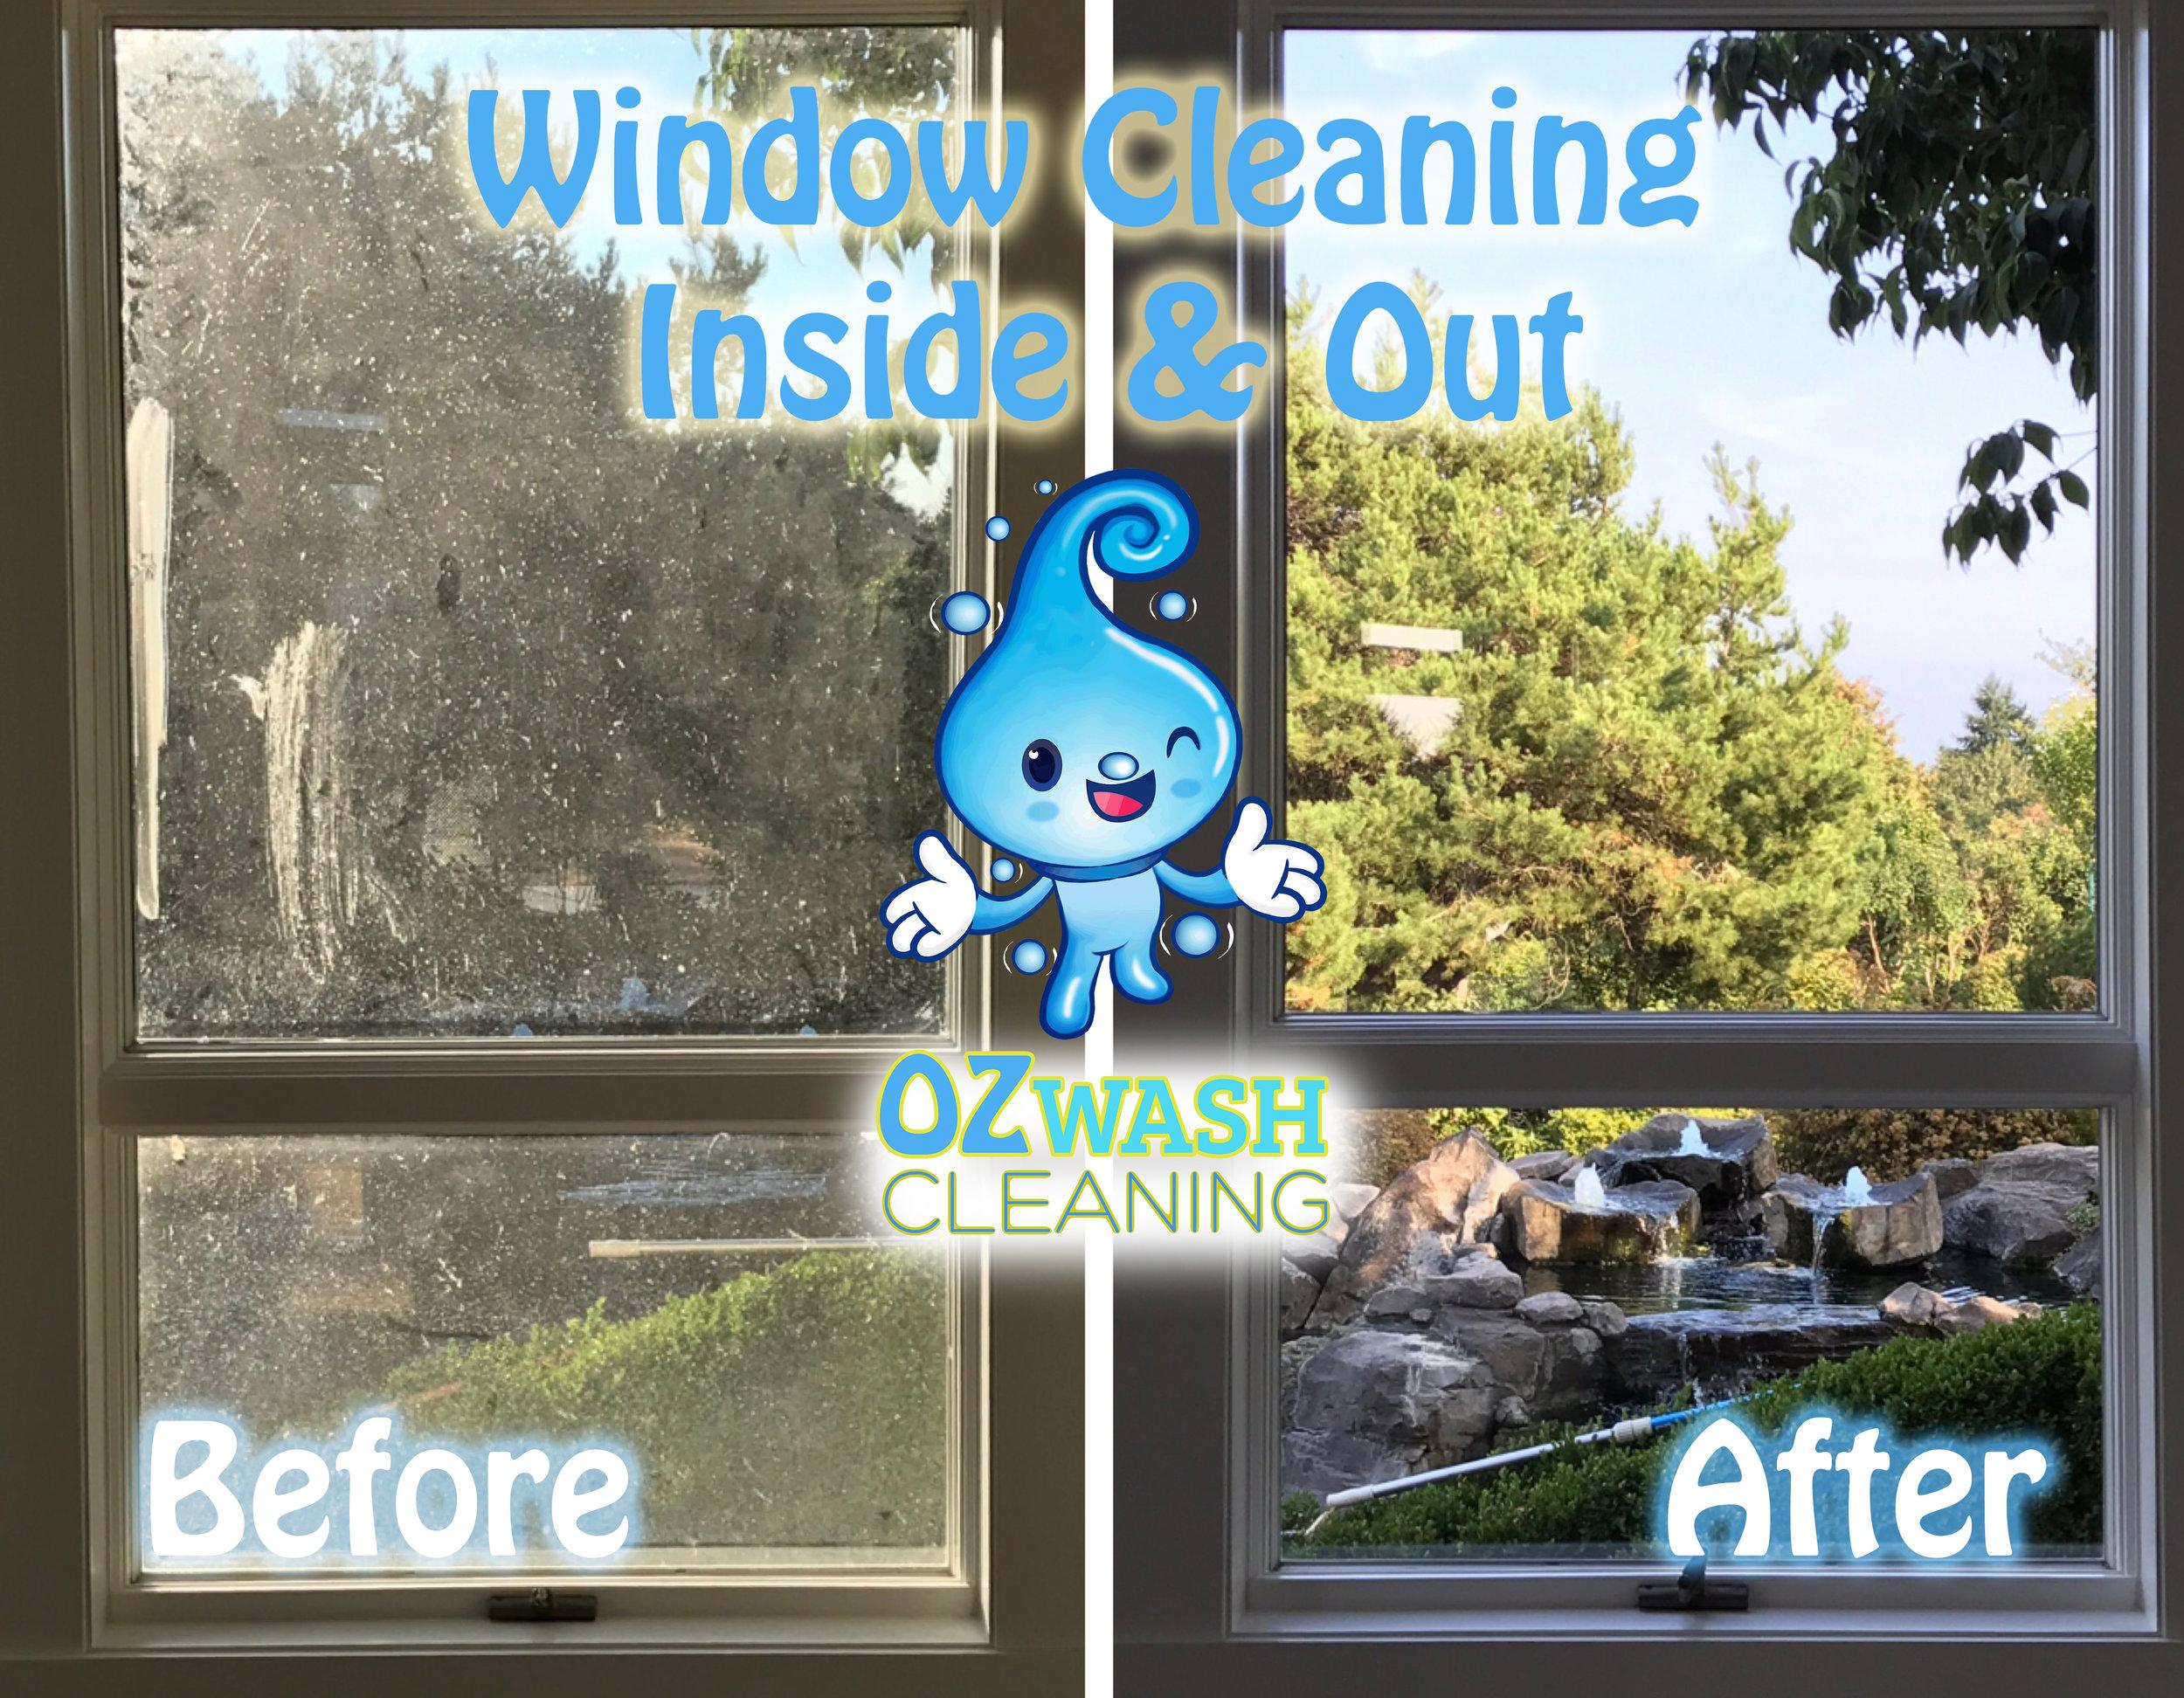 WindowCleaning3.jpg